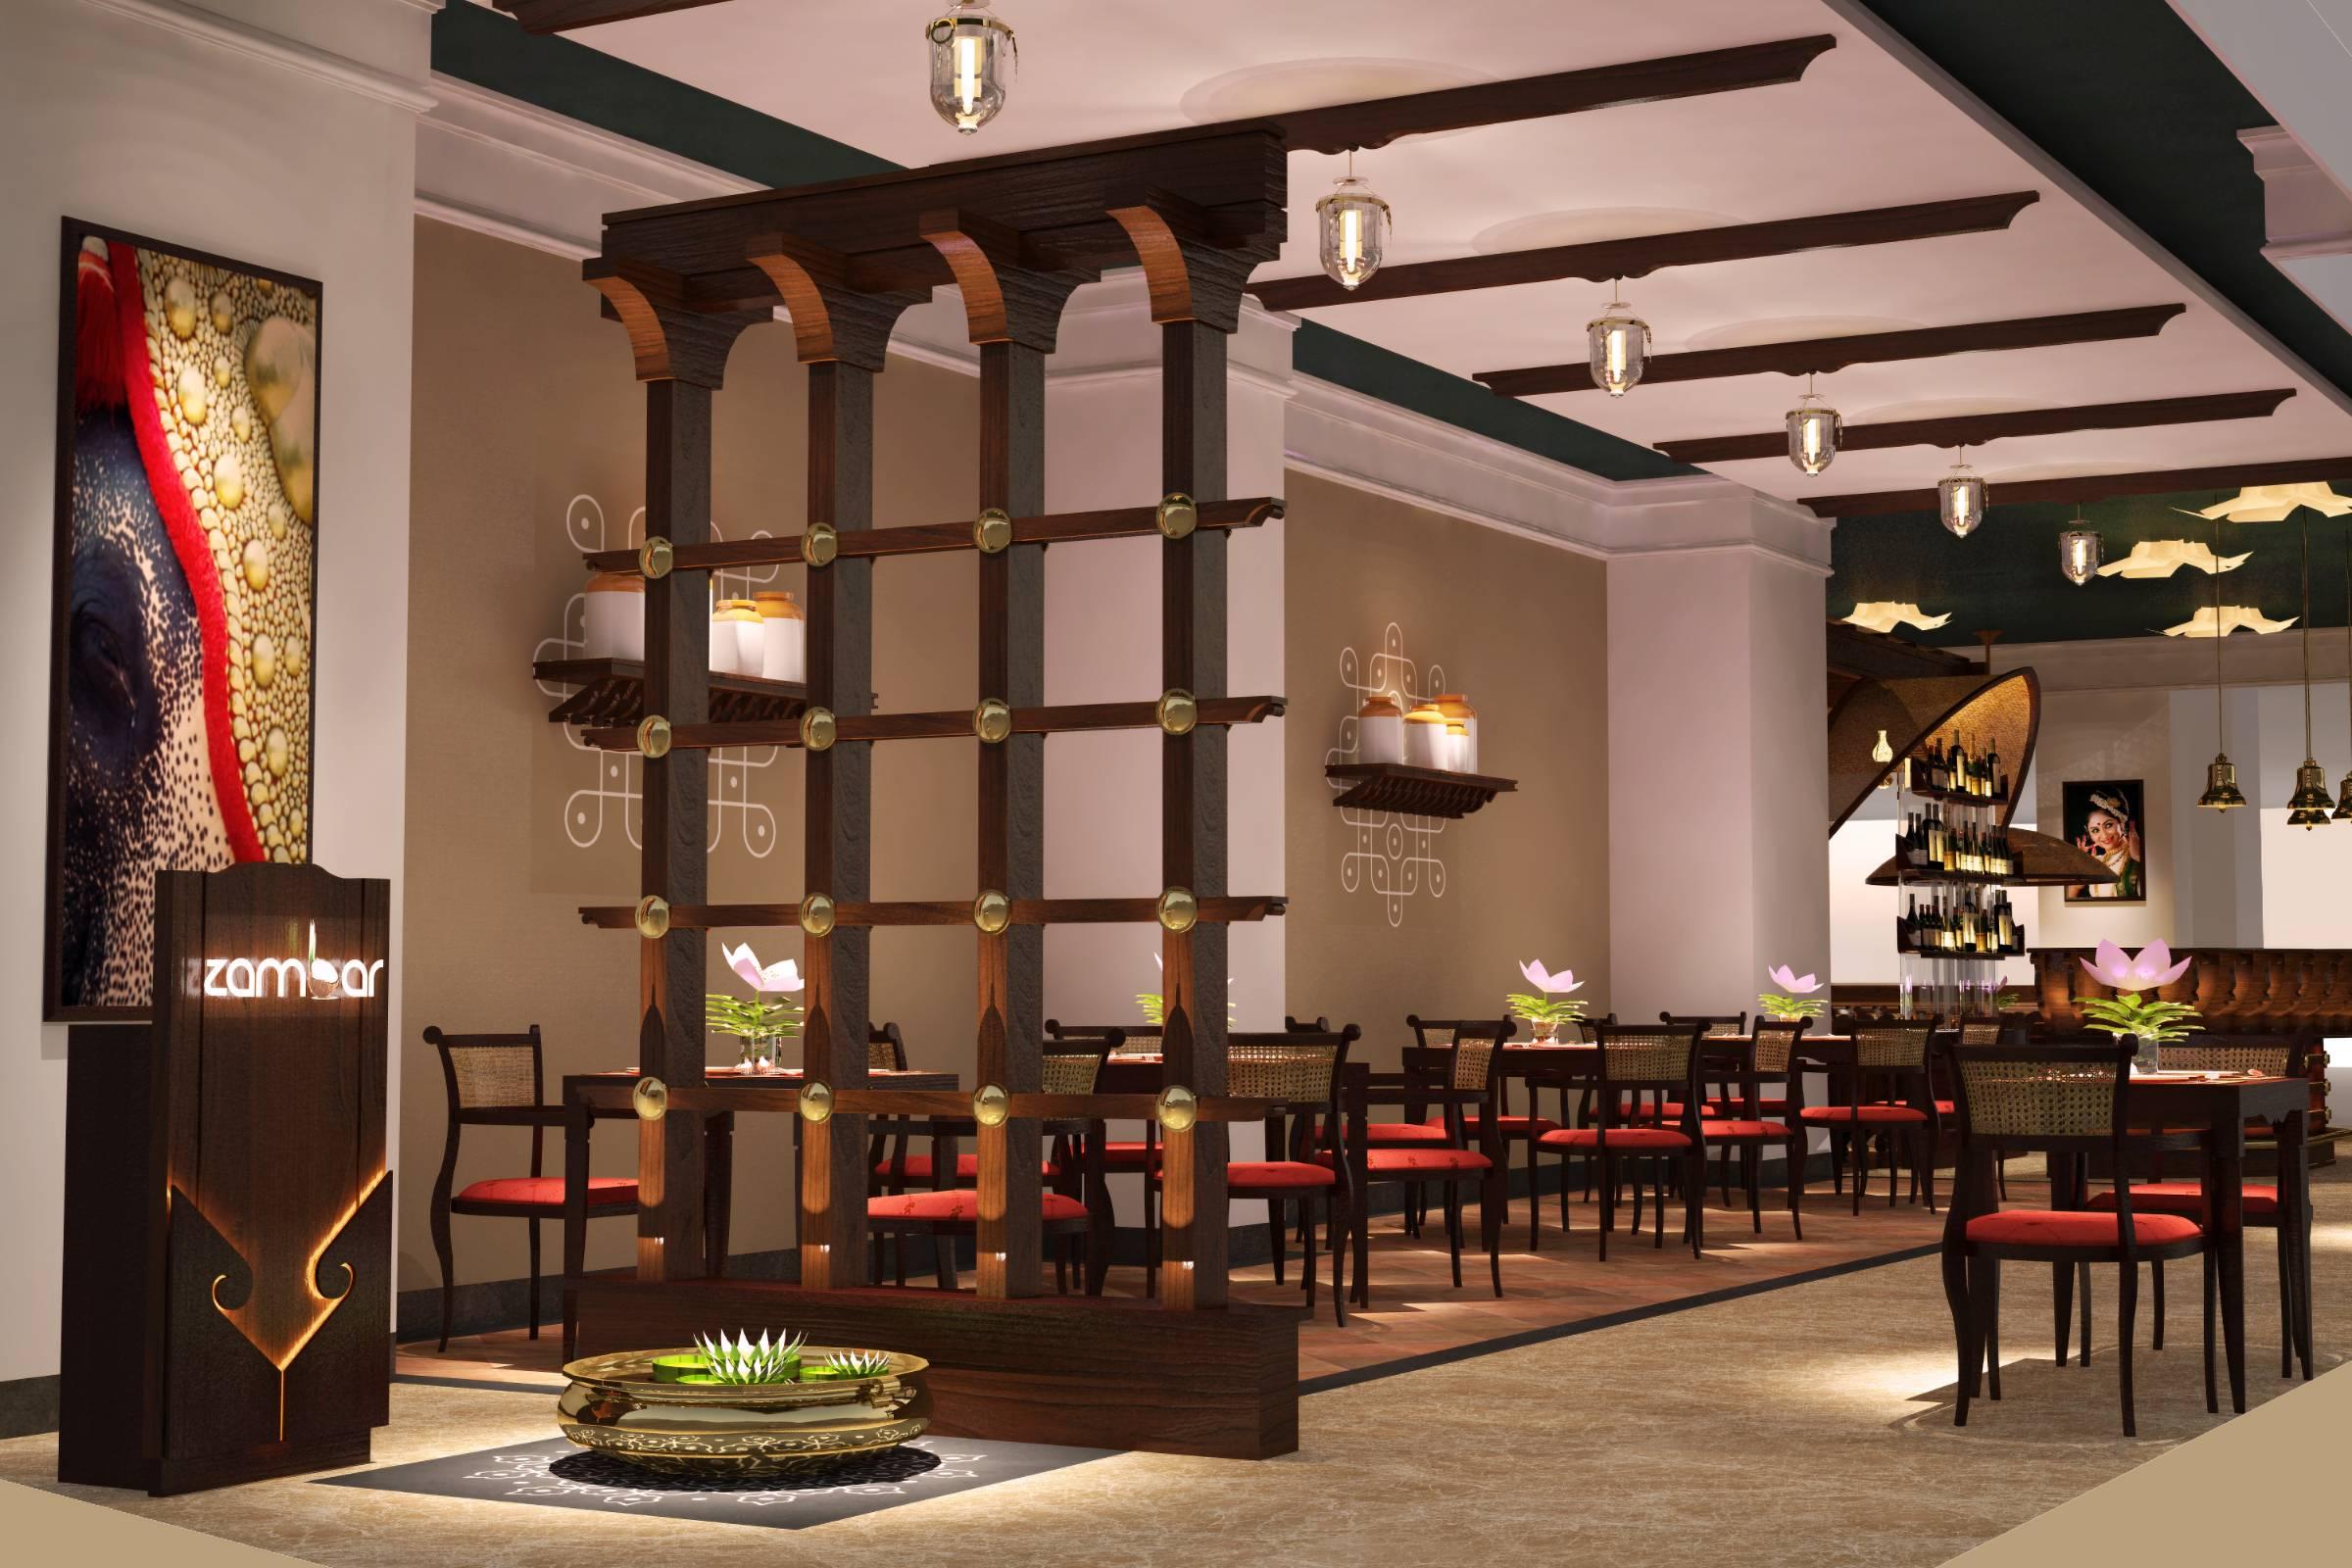 Zambar restaurant lobby with urli and trellis